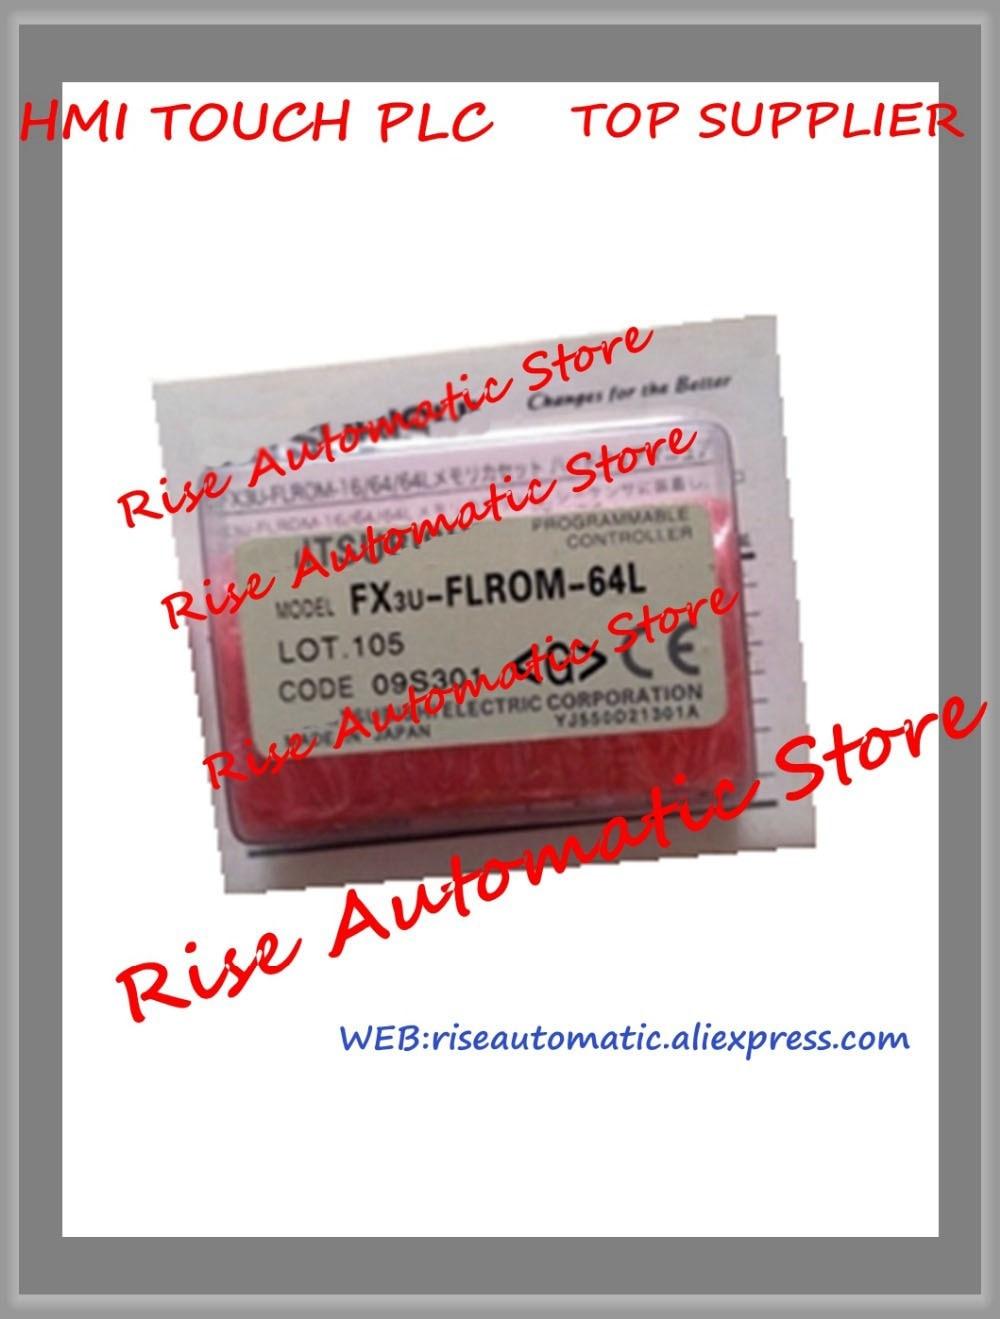 New Original Programmable Logic Controller FX3U-FLROM-64L PLC Memory Cassette plc memory cassette fx3u flrom 16 new original well tested working three months warranty